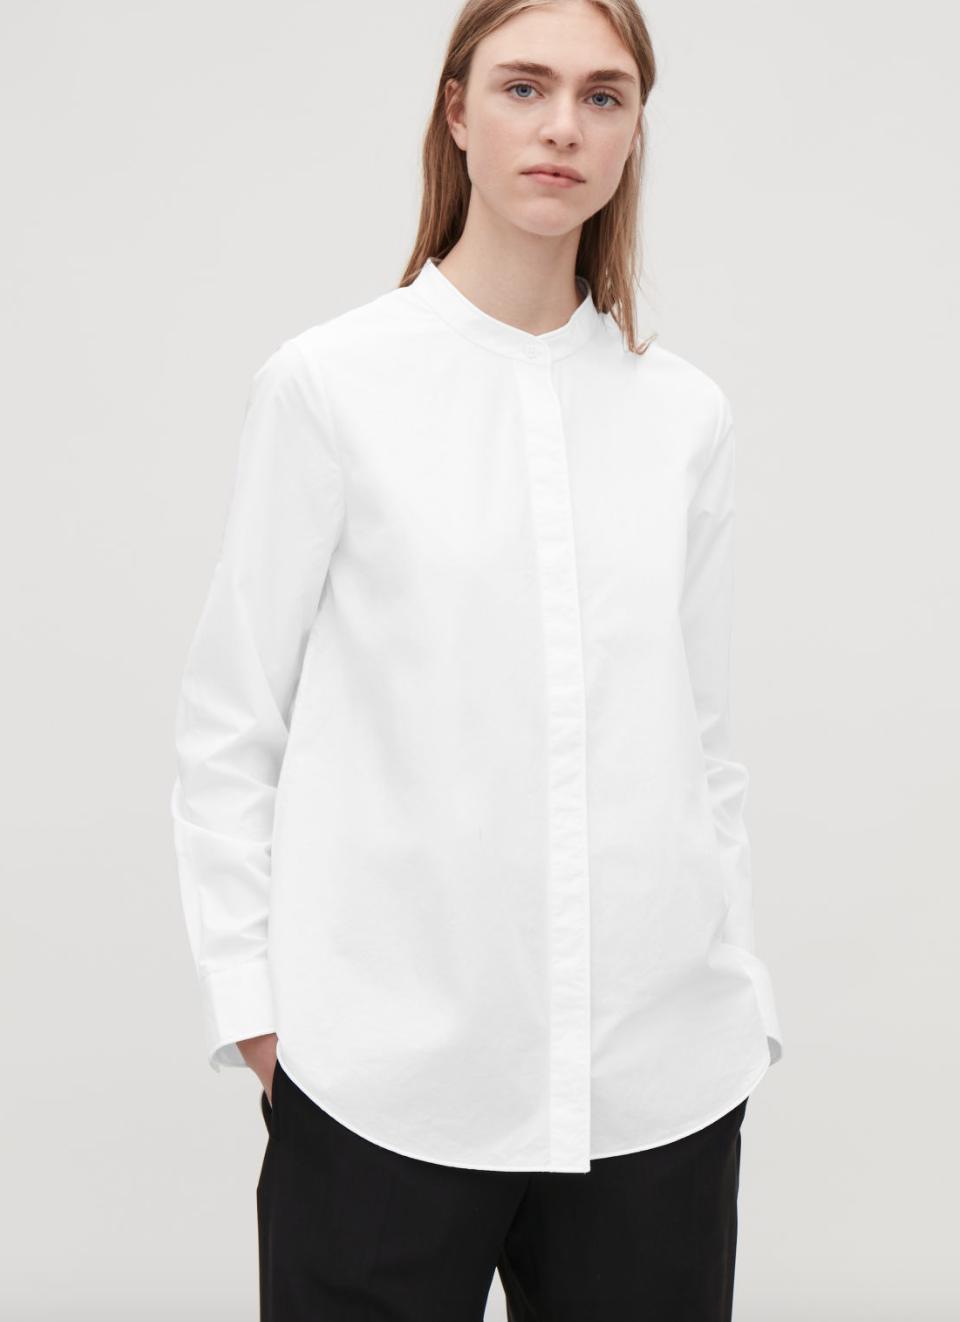 Cos, Shirt, £59.00